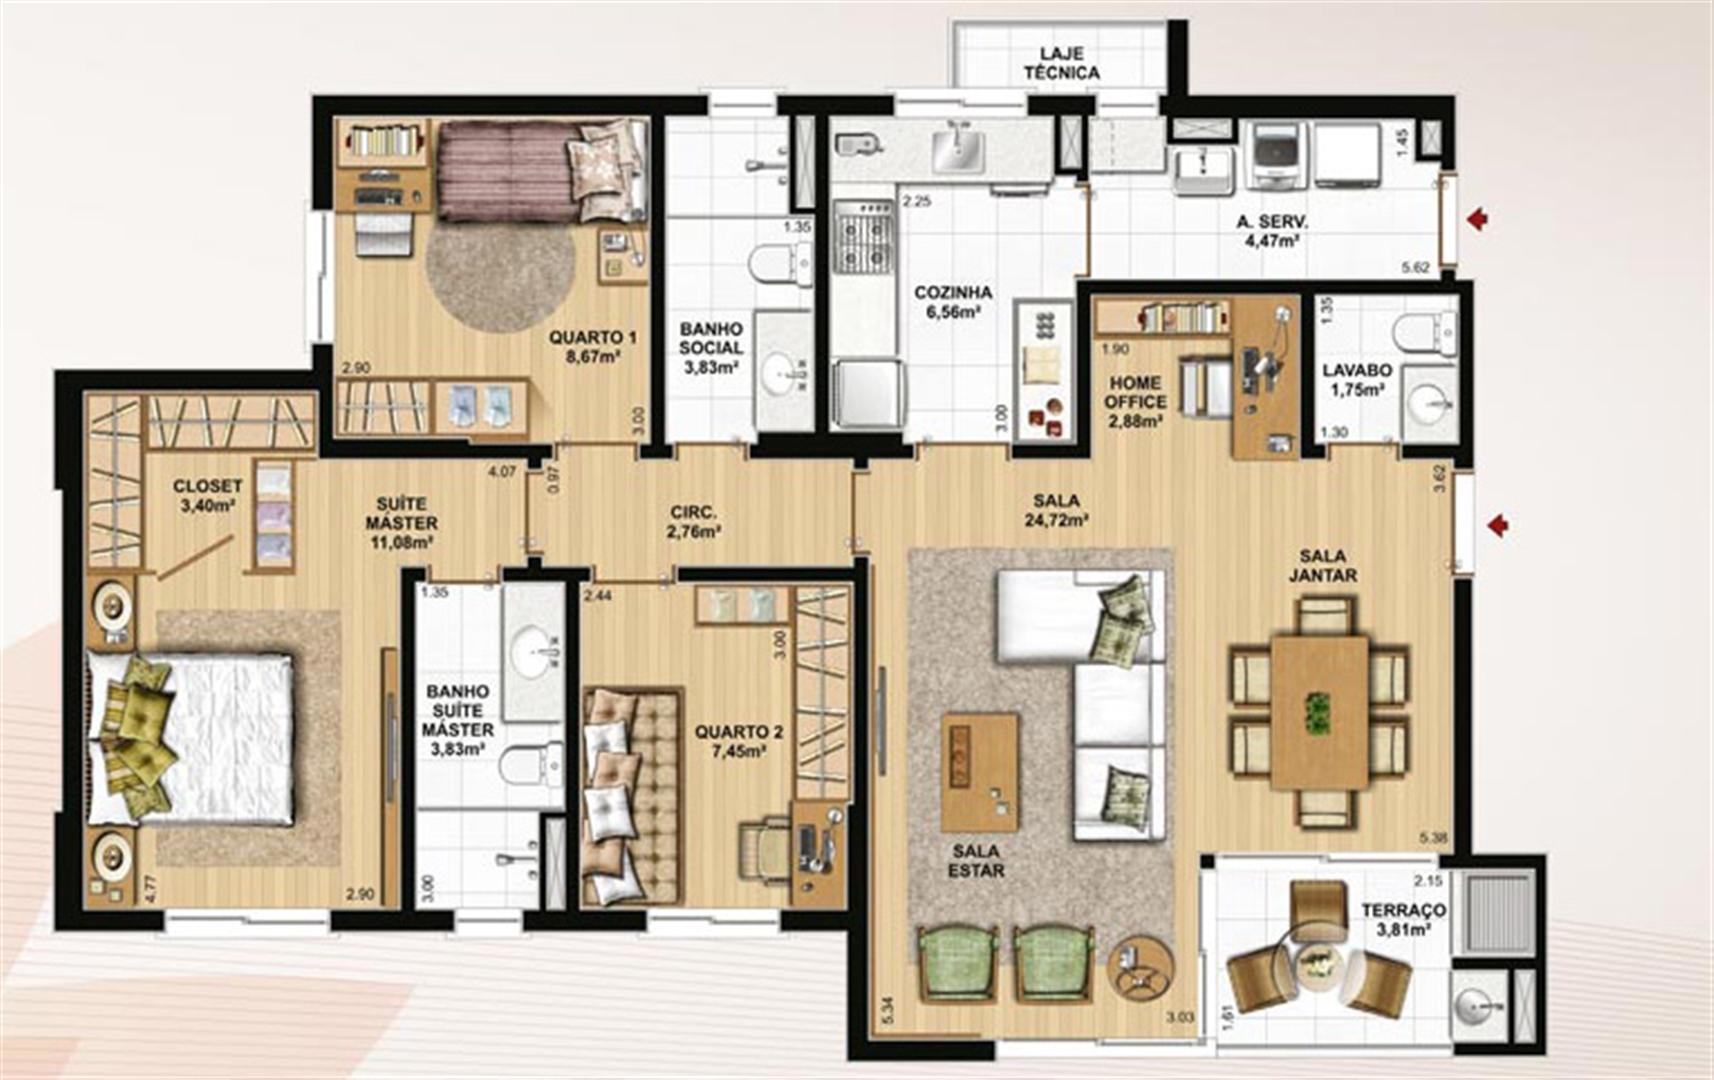 106 m² privativos, 3 dormitórios, lavabo e home office | Le Jardin Residencial – Apartamento no  Água Verde - Curitiba - Paraná